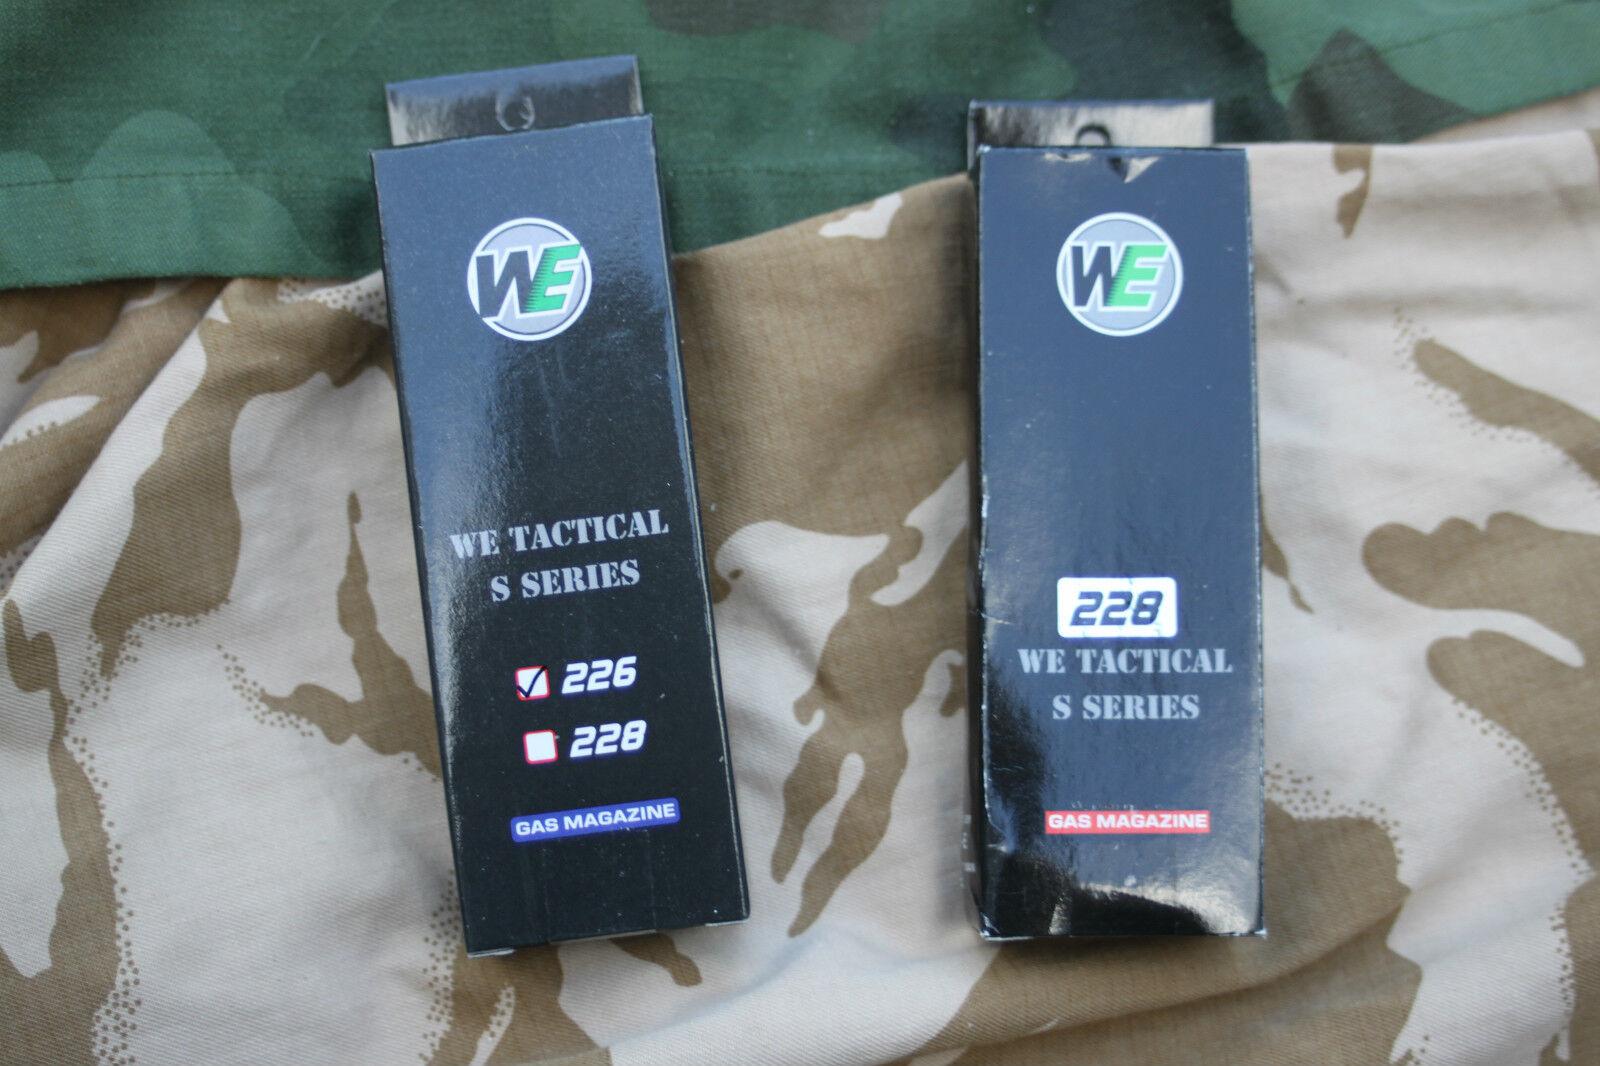 Airsoft, WE, WE GBB, WE 226 mag, WE 228 mag, WE 229 mag, WE Gas Mags